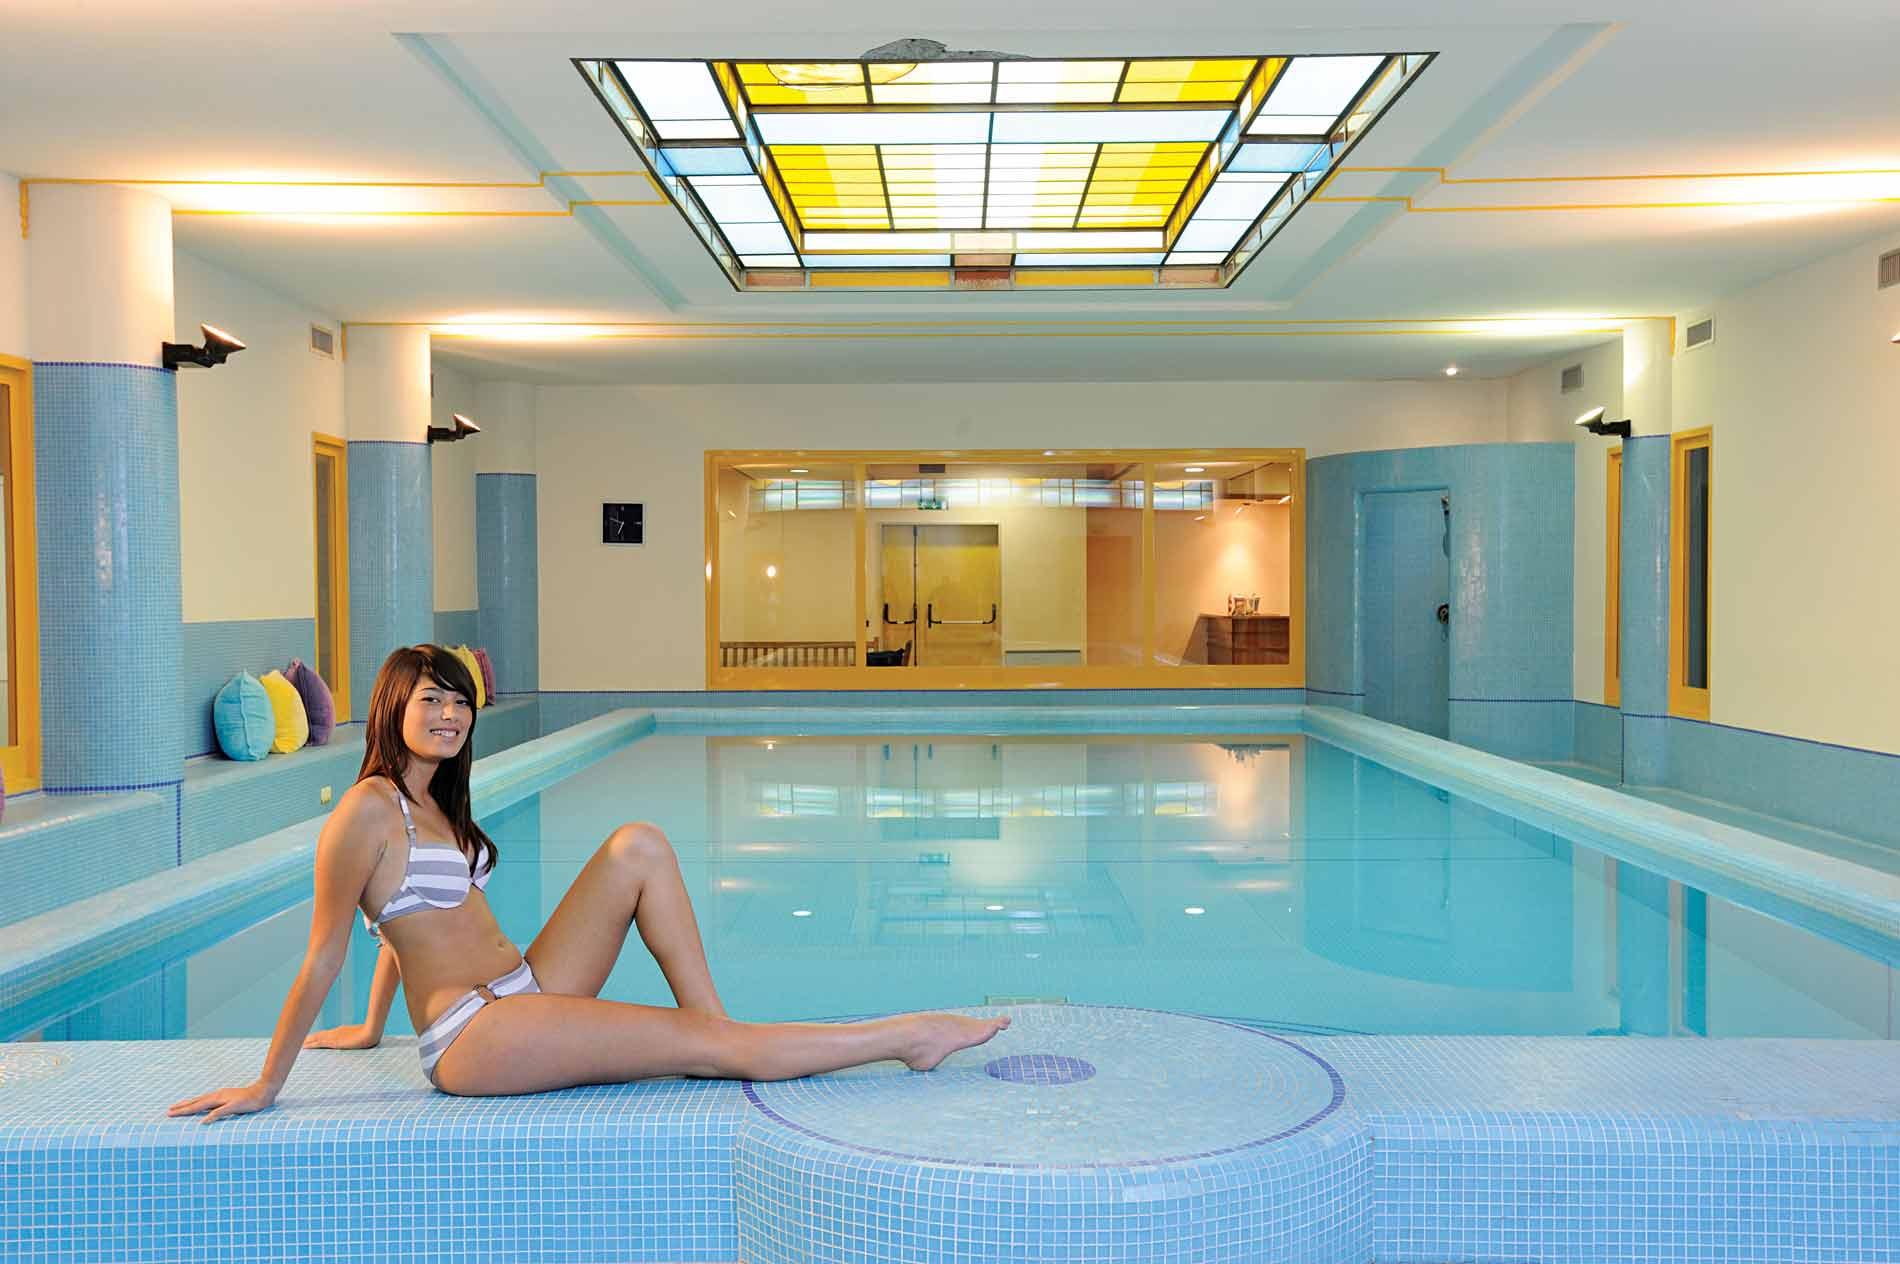 Conferenze archives visit tivoli - Parco tivoli piscina ...